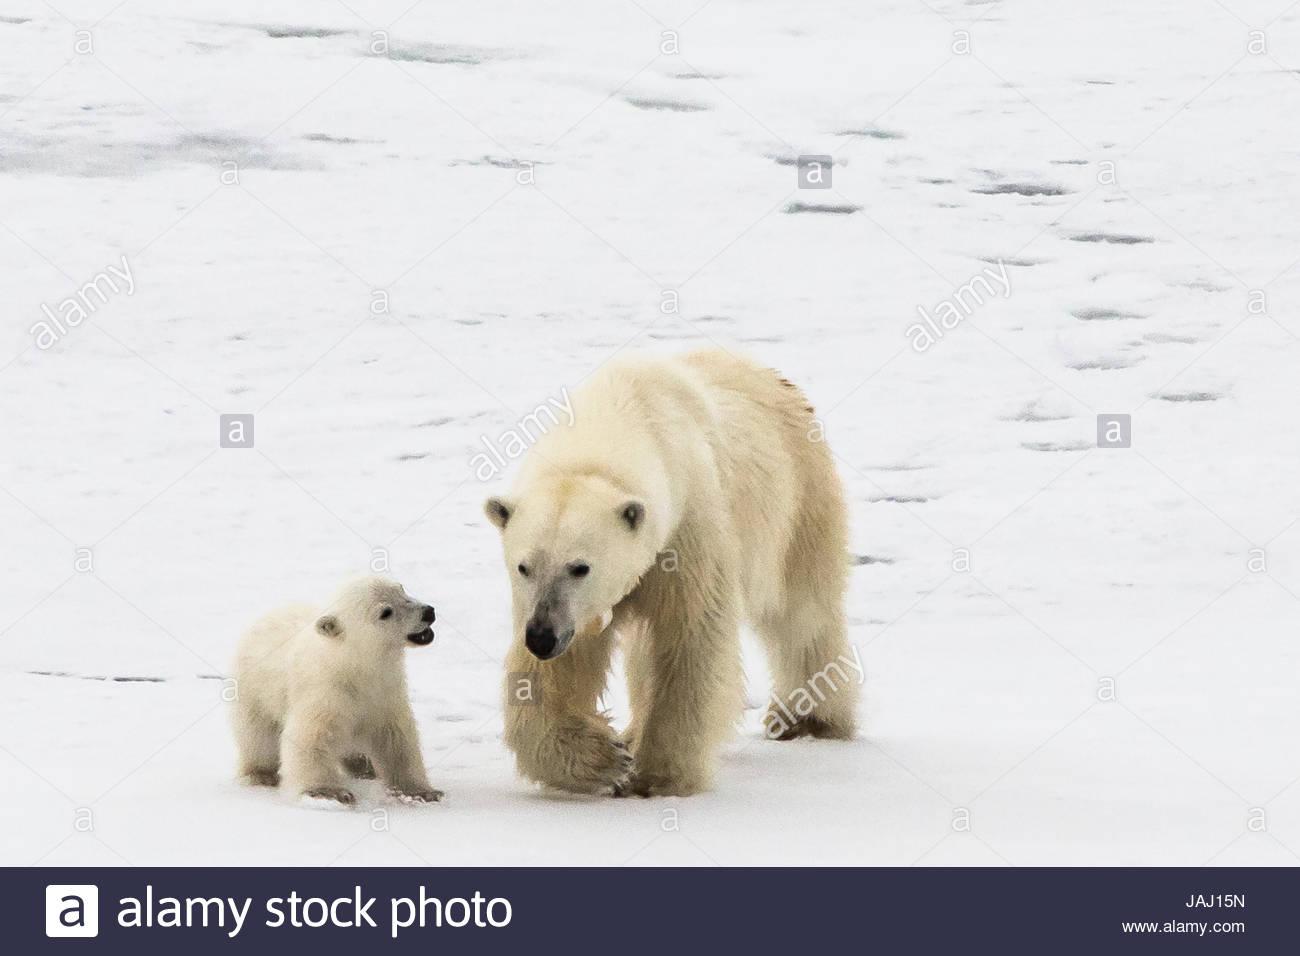 A polar bear, Ursus maritimus, and her cub. - Stock Image